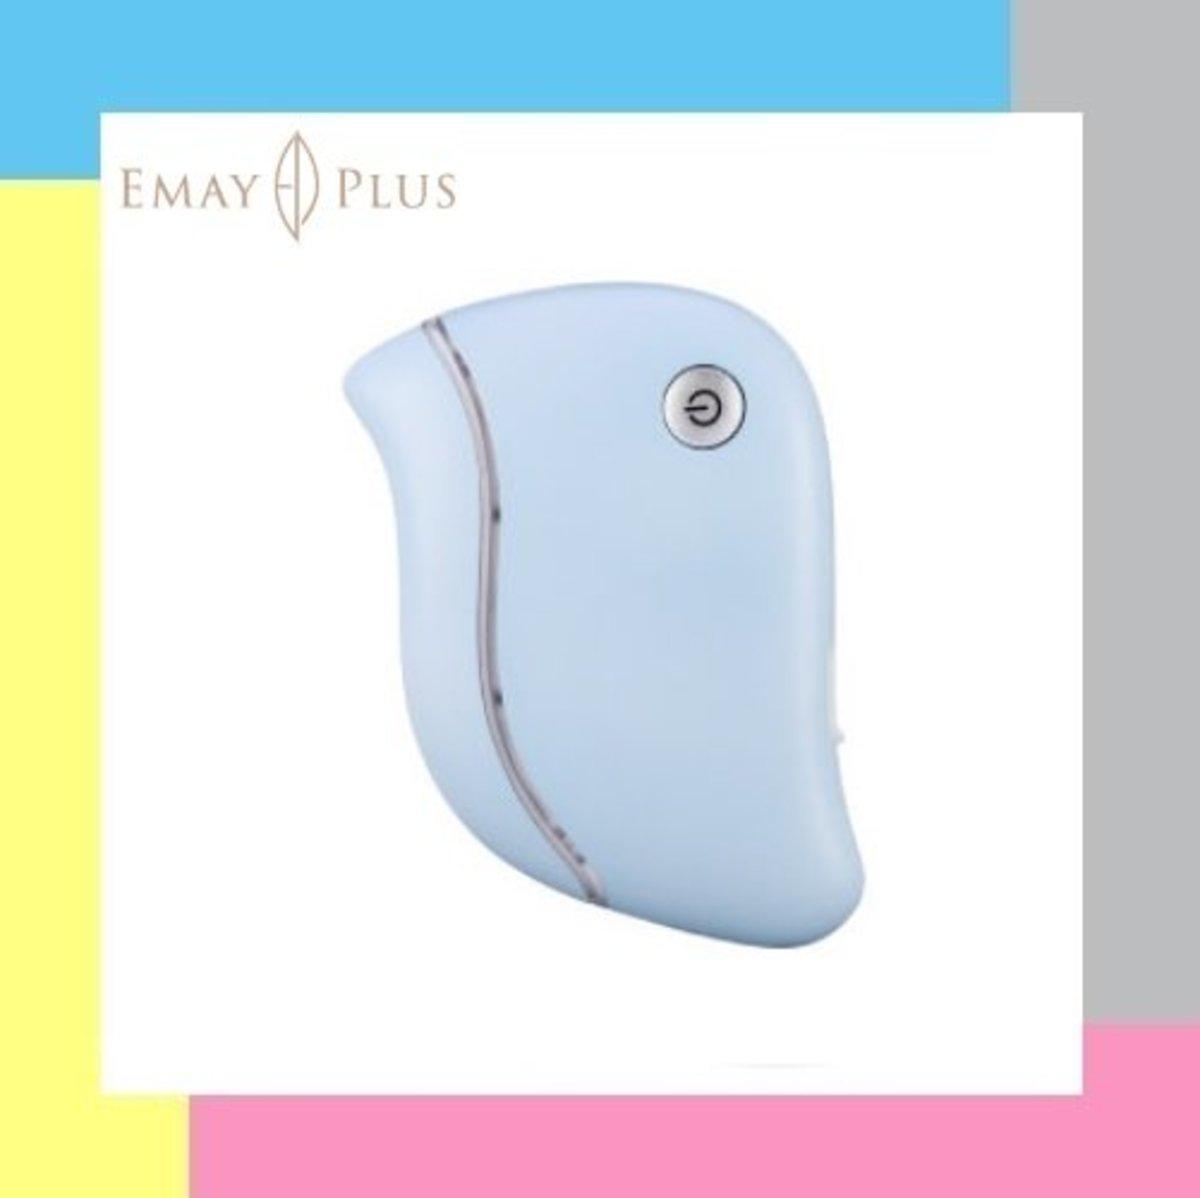 EP-406 Face Detox Slimmer - Blue